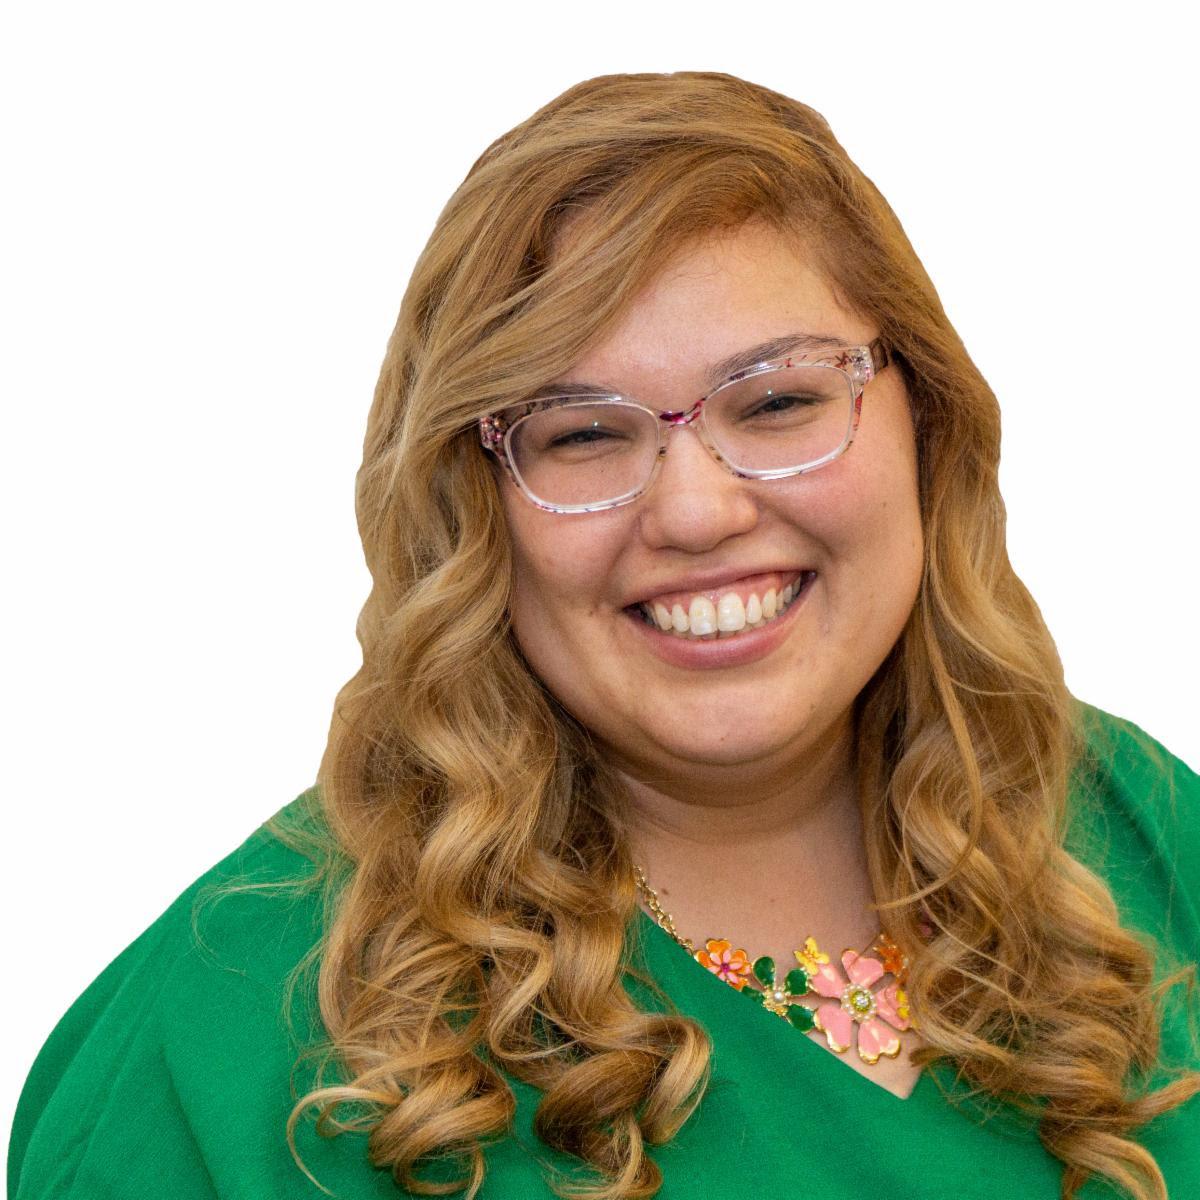 Arizona Teacher of the Year finalists named ecb81734-e281-46b3-9d7c-d65e5c0807bf